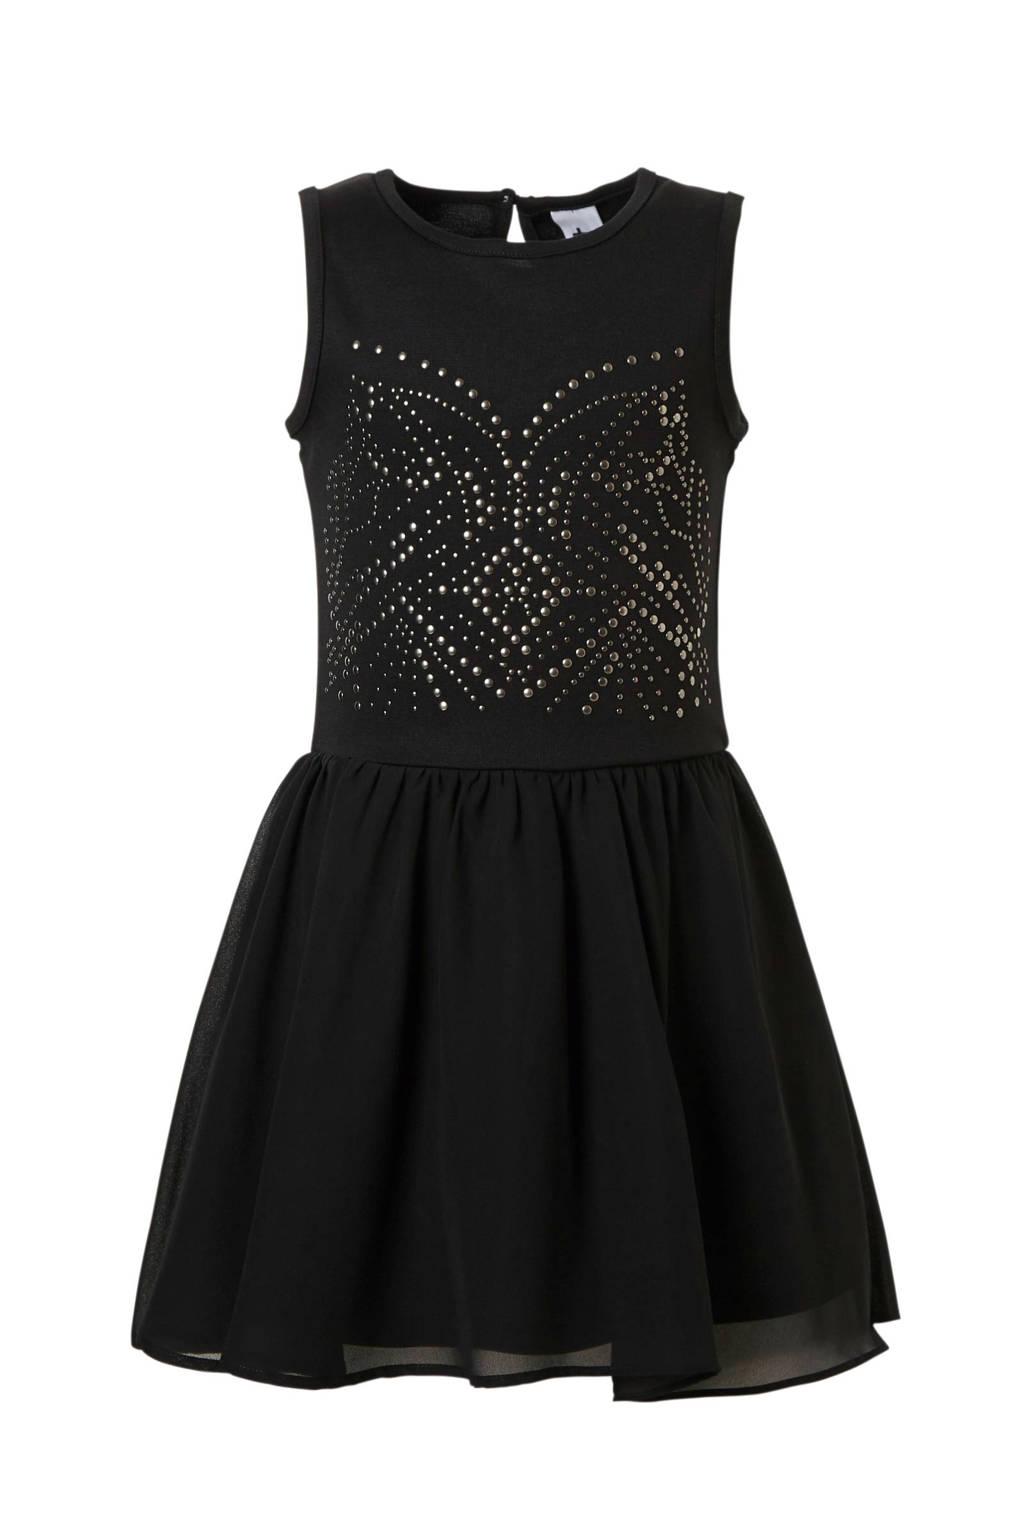 e9f50859ffec48 C A Here   There jurk met studs zwart